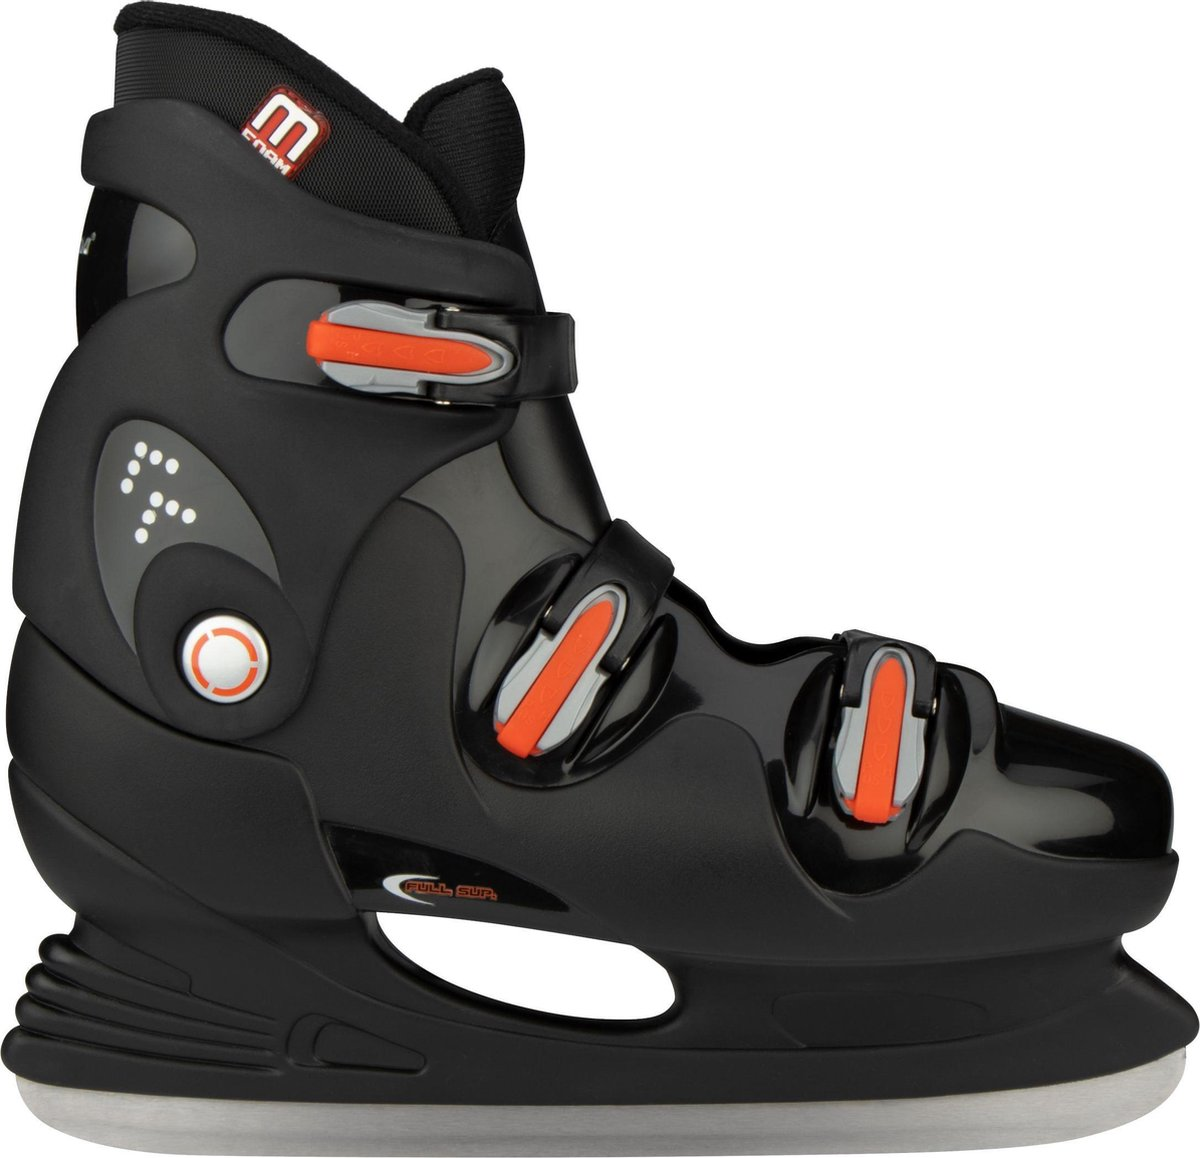 Nijdam IJshockeyschaats - Hardboot - Zwart/Zilver/Rood - 46